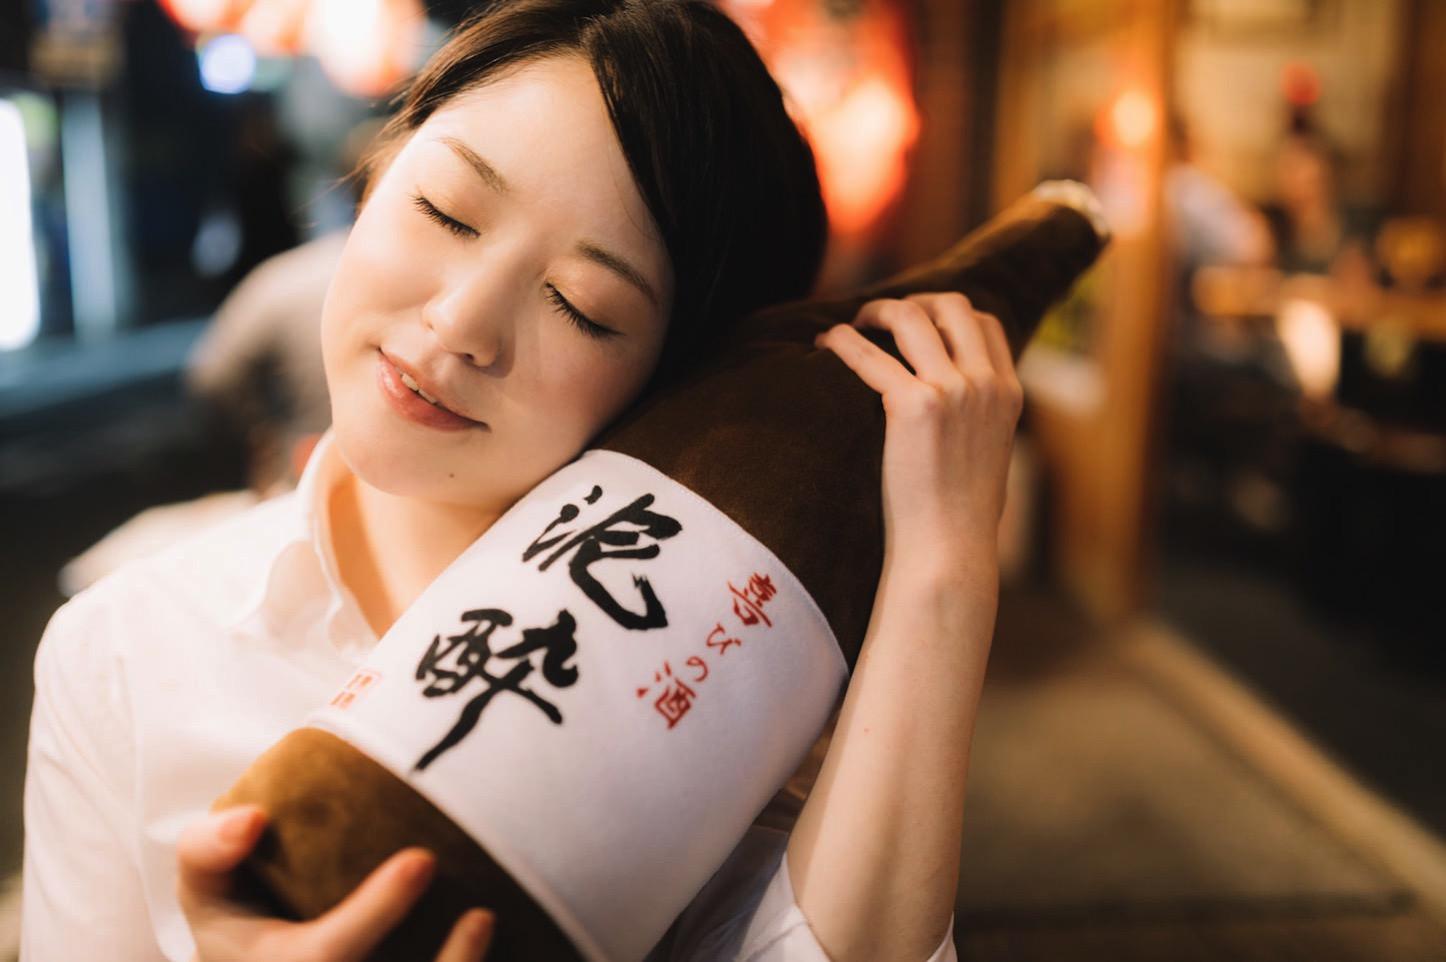 Pakutaso-Beer-Sake-Girl.jpg